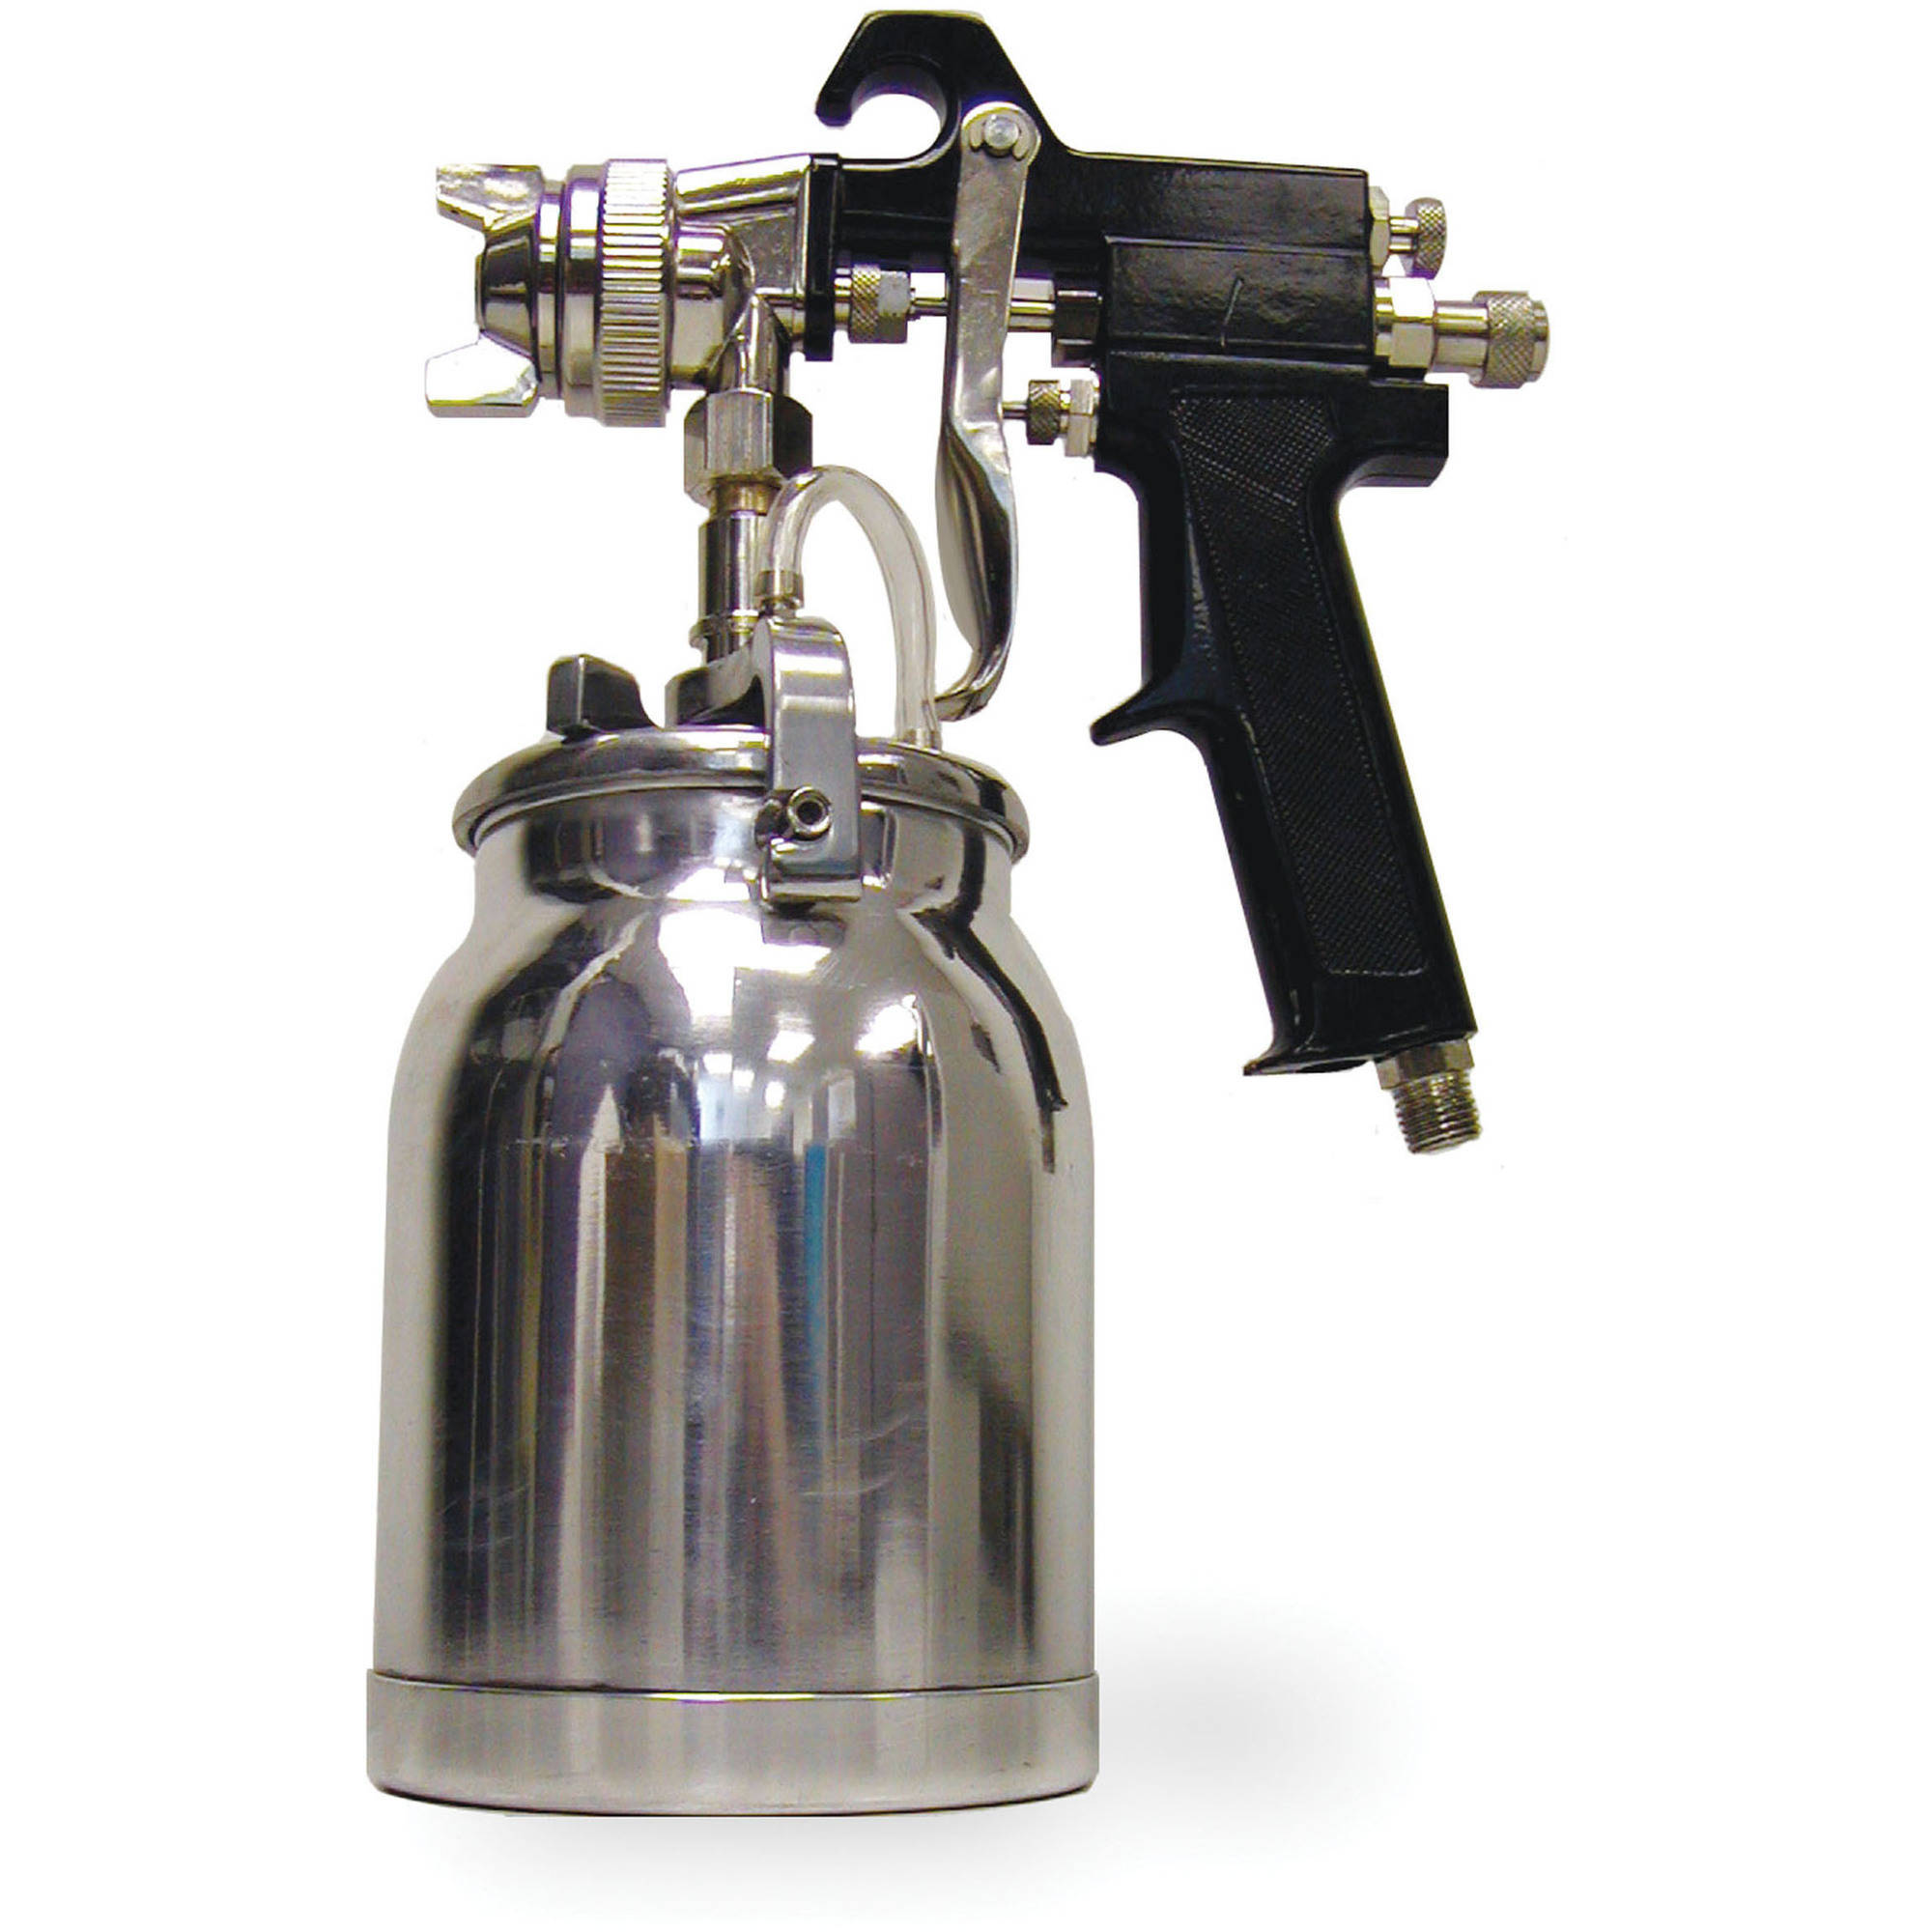 Buffalo Tools 1 qt Industrial Paint Spray Gun